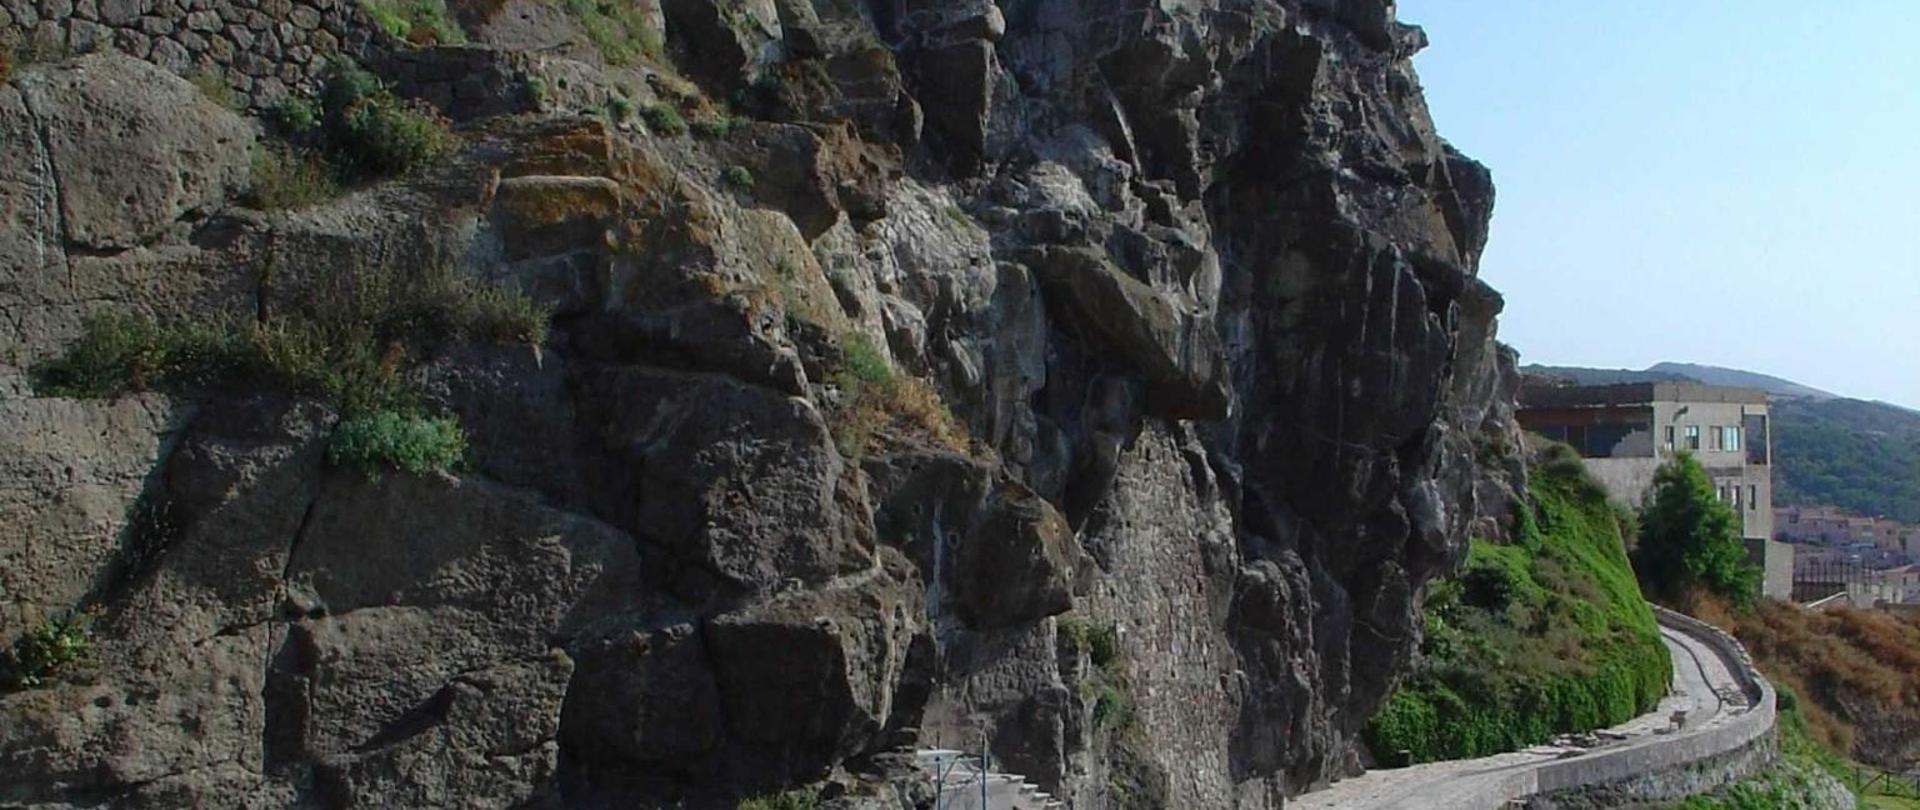 castelsardo-rocca.jpg